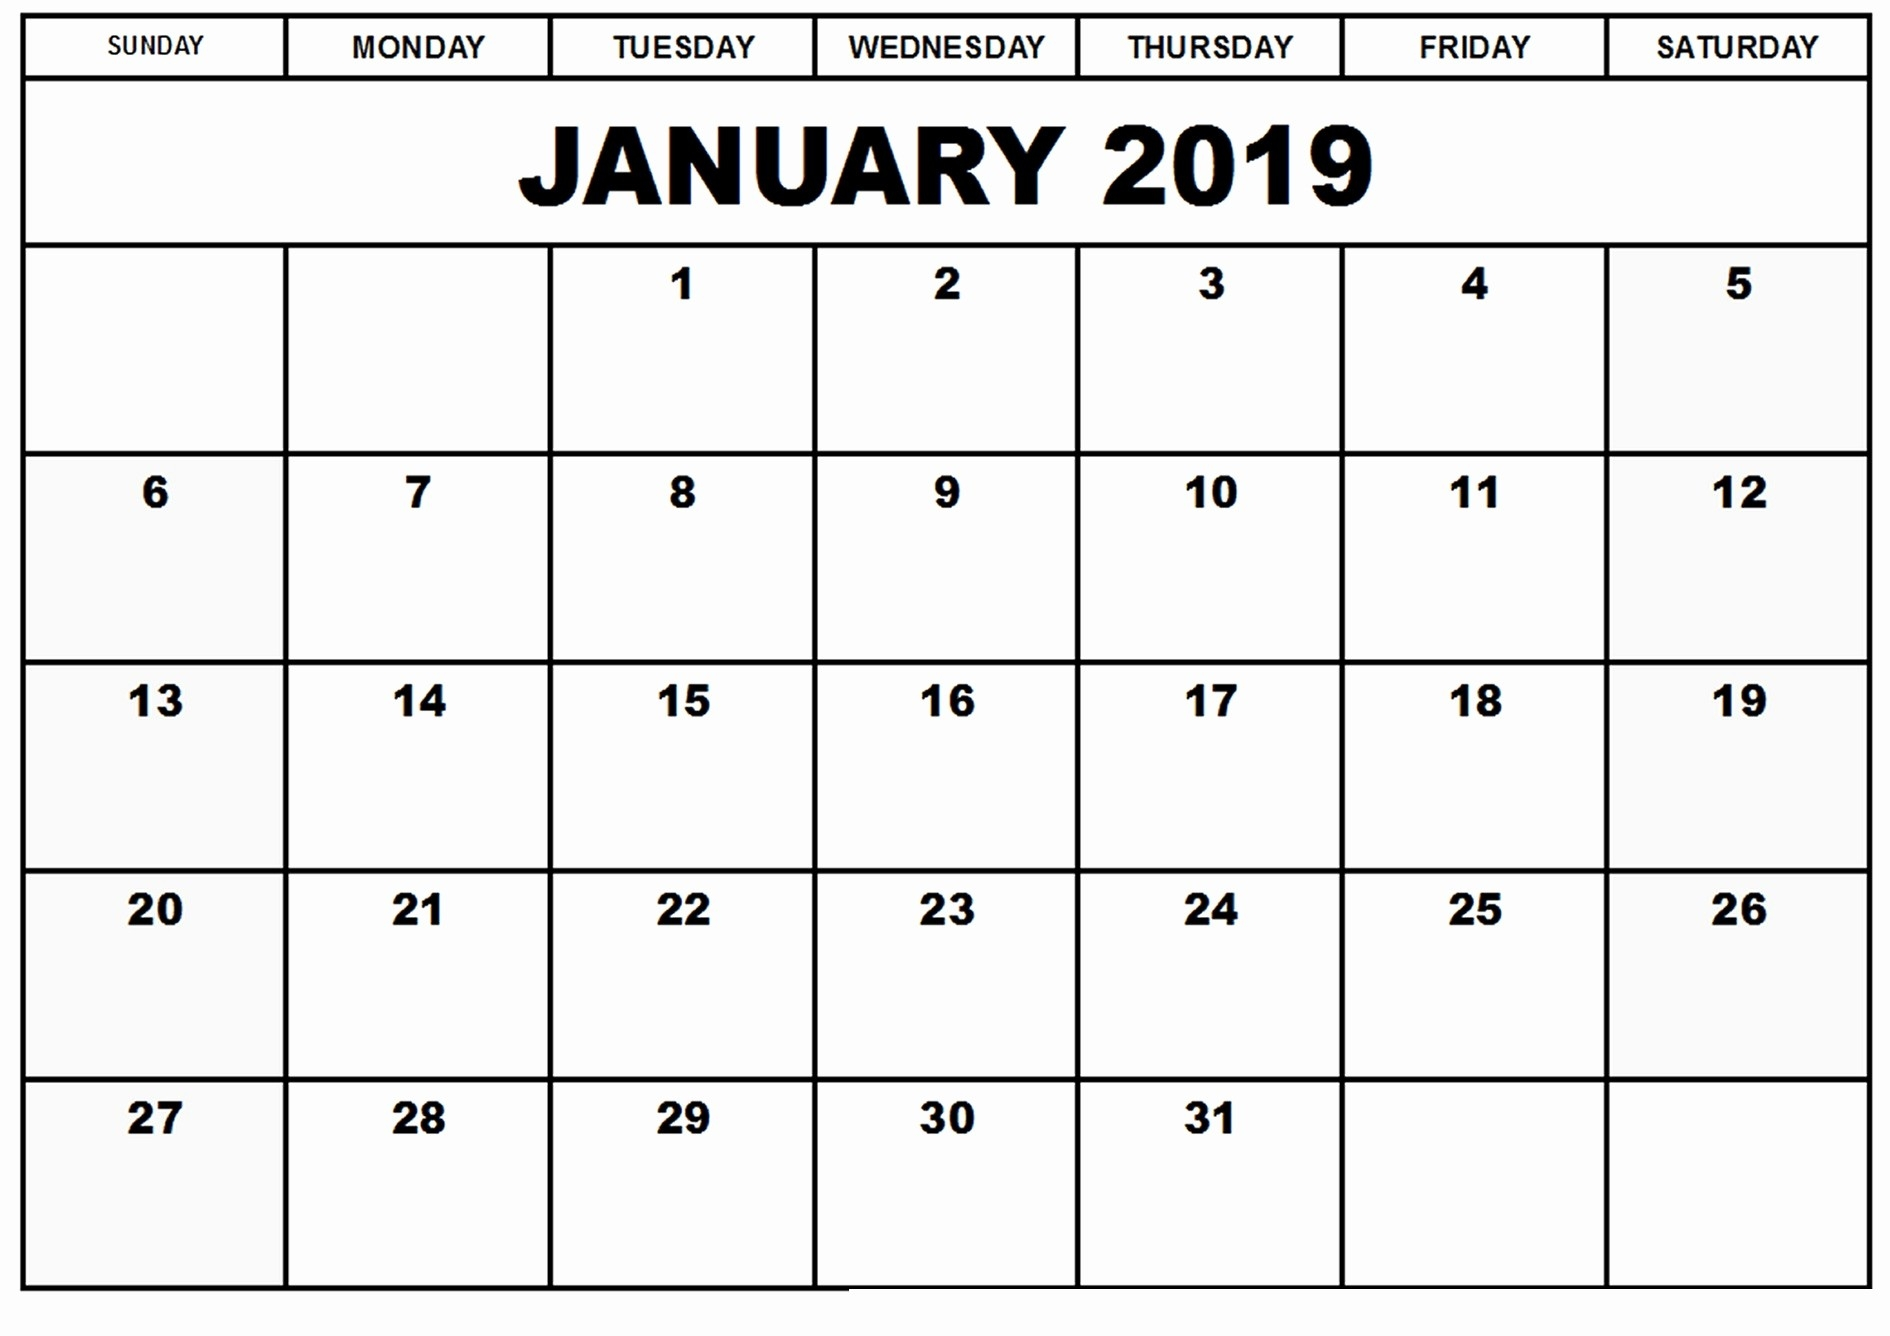 Blank Calendar Template 2019 Uk Printable Calendar 2019 Uk-Calendar Labs 2020 Templates